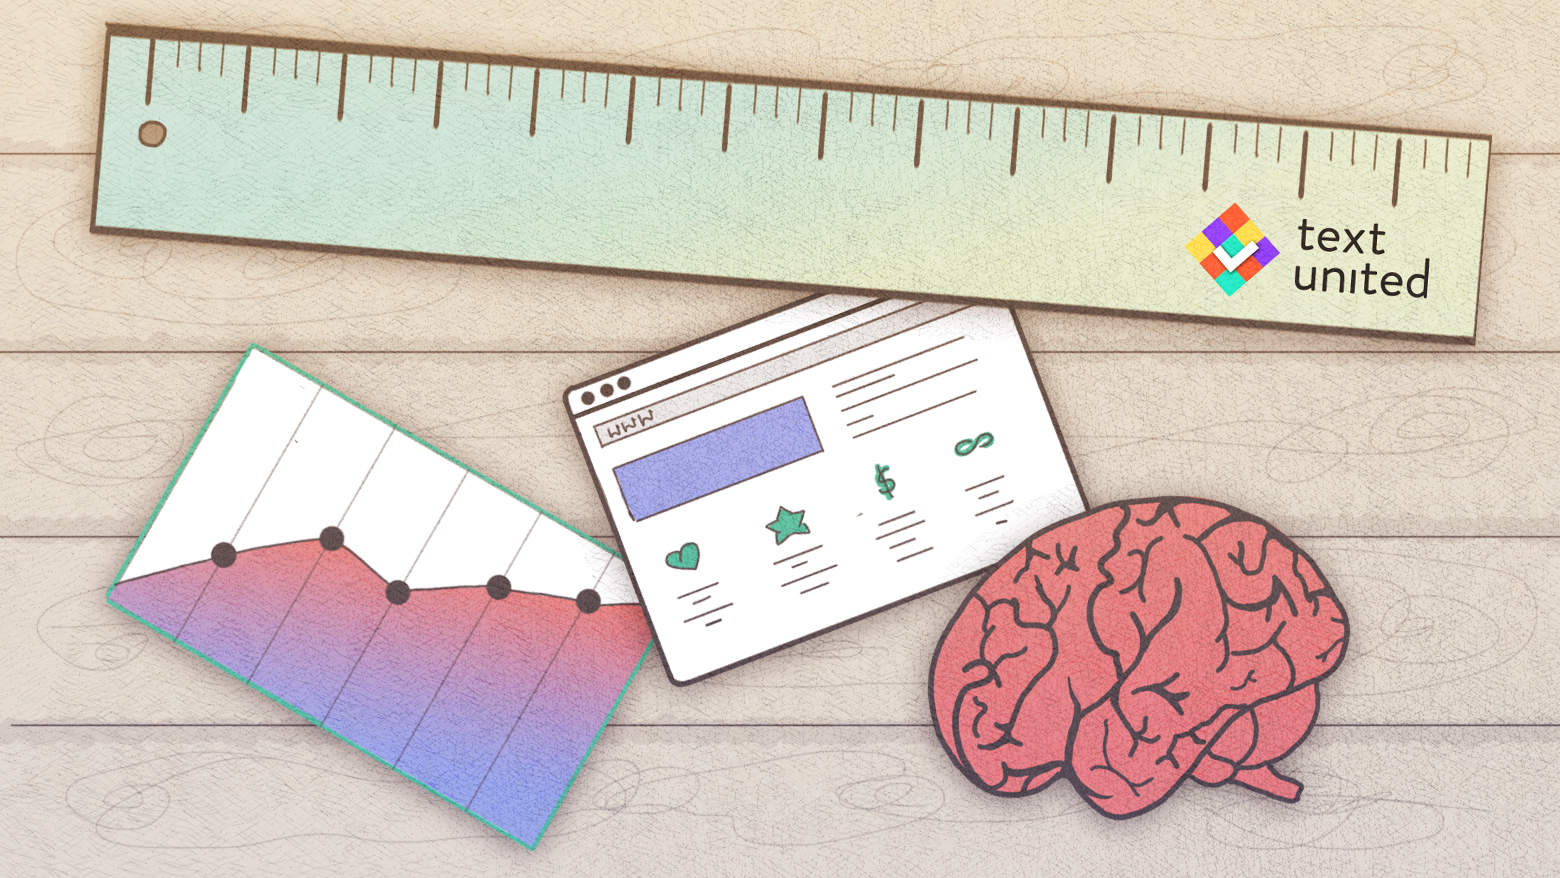 How to Measure Translation Performance?